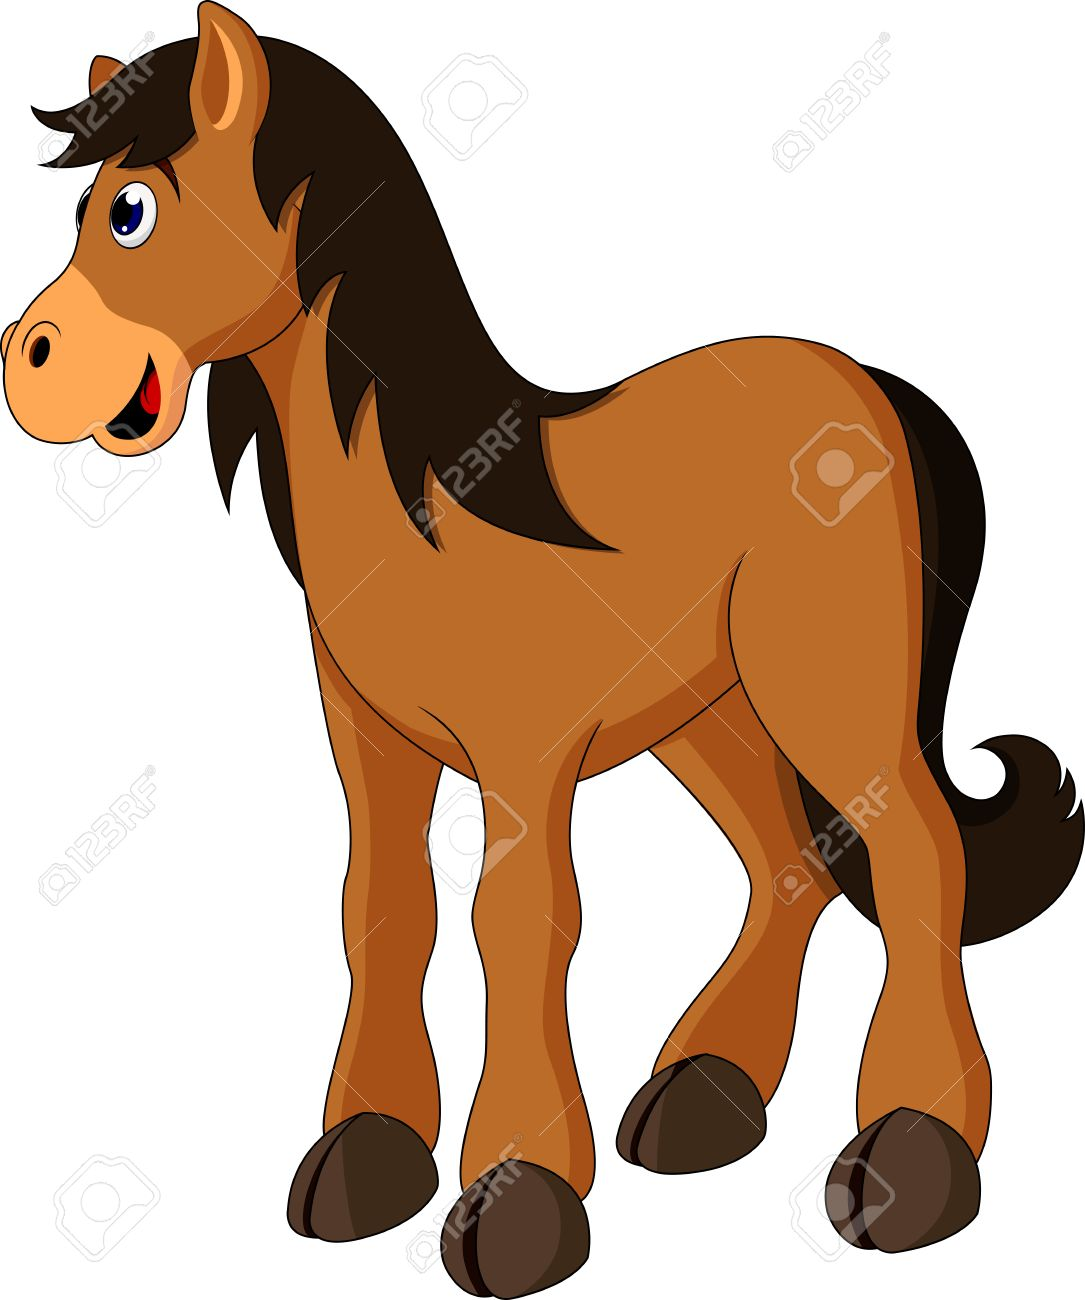 Картинки по запросу horse cartoon